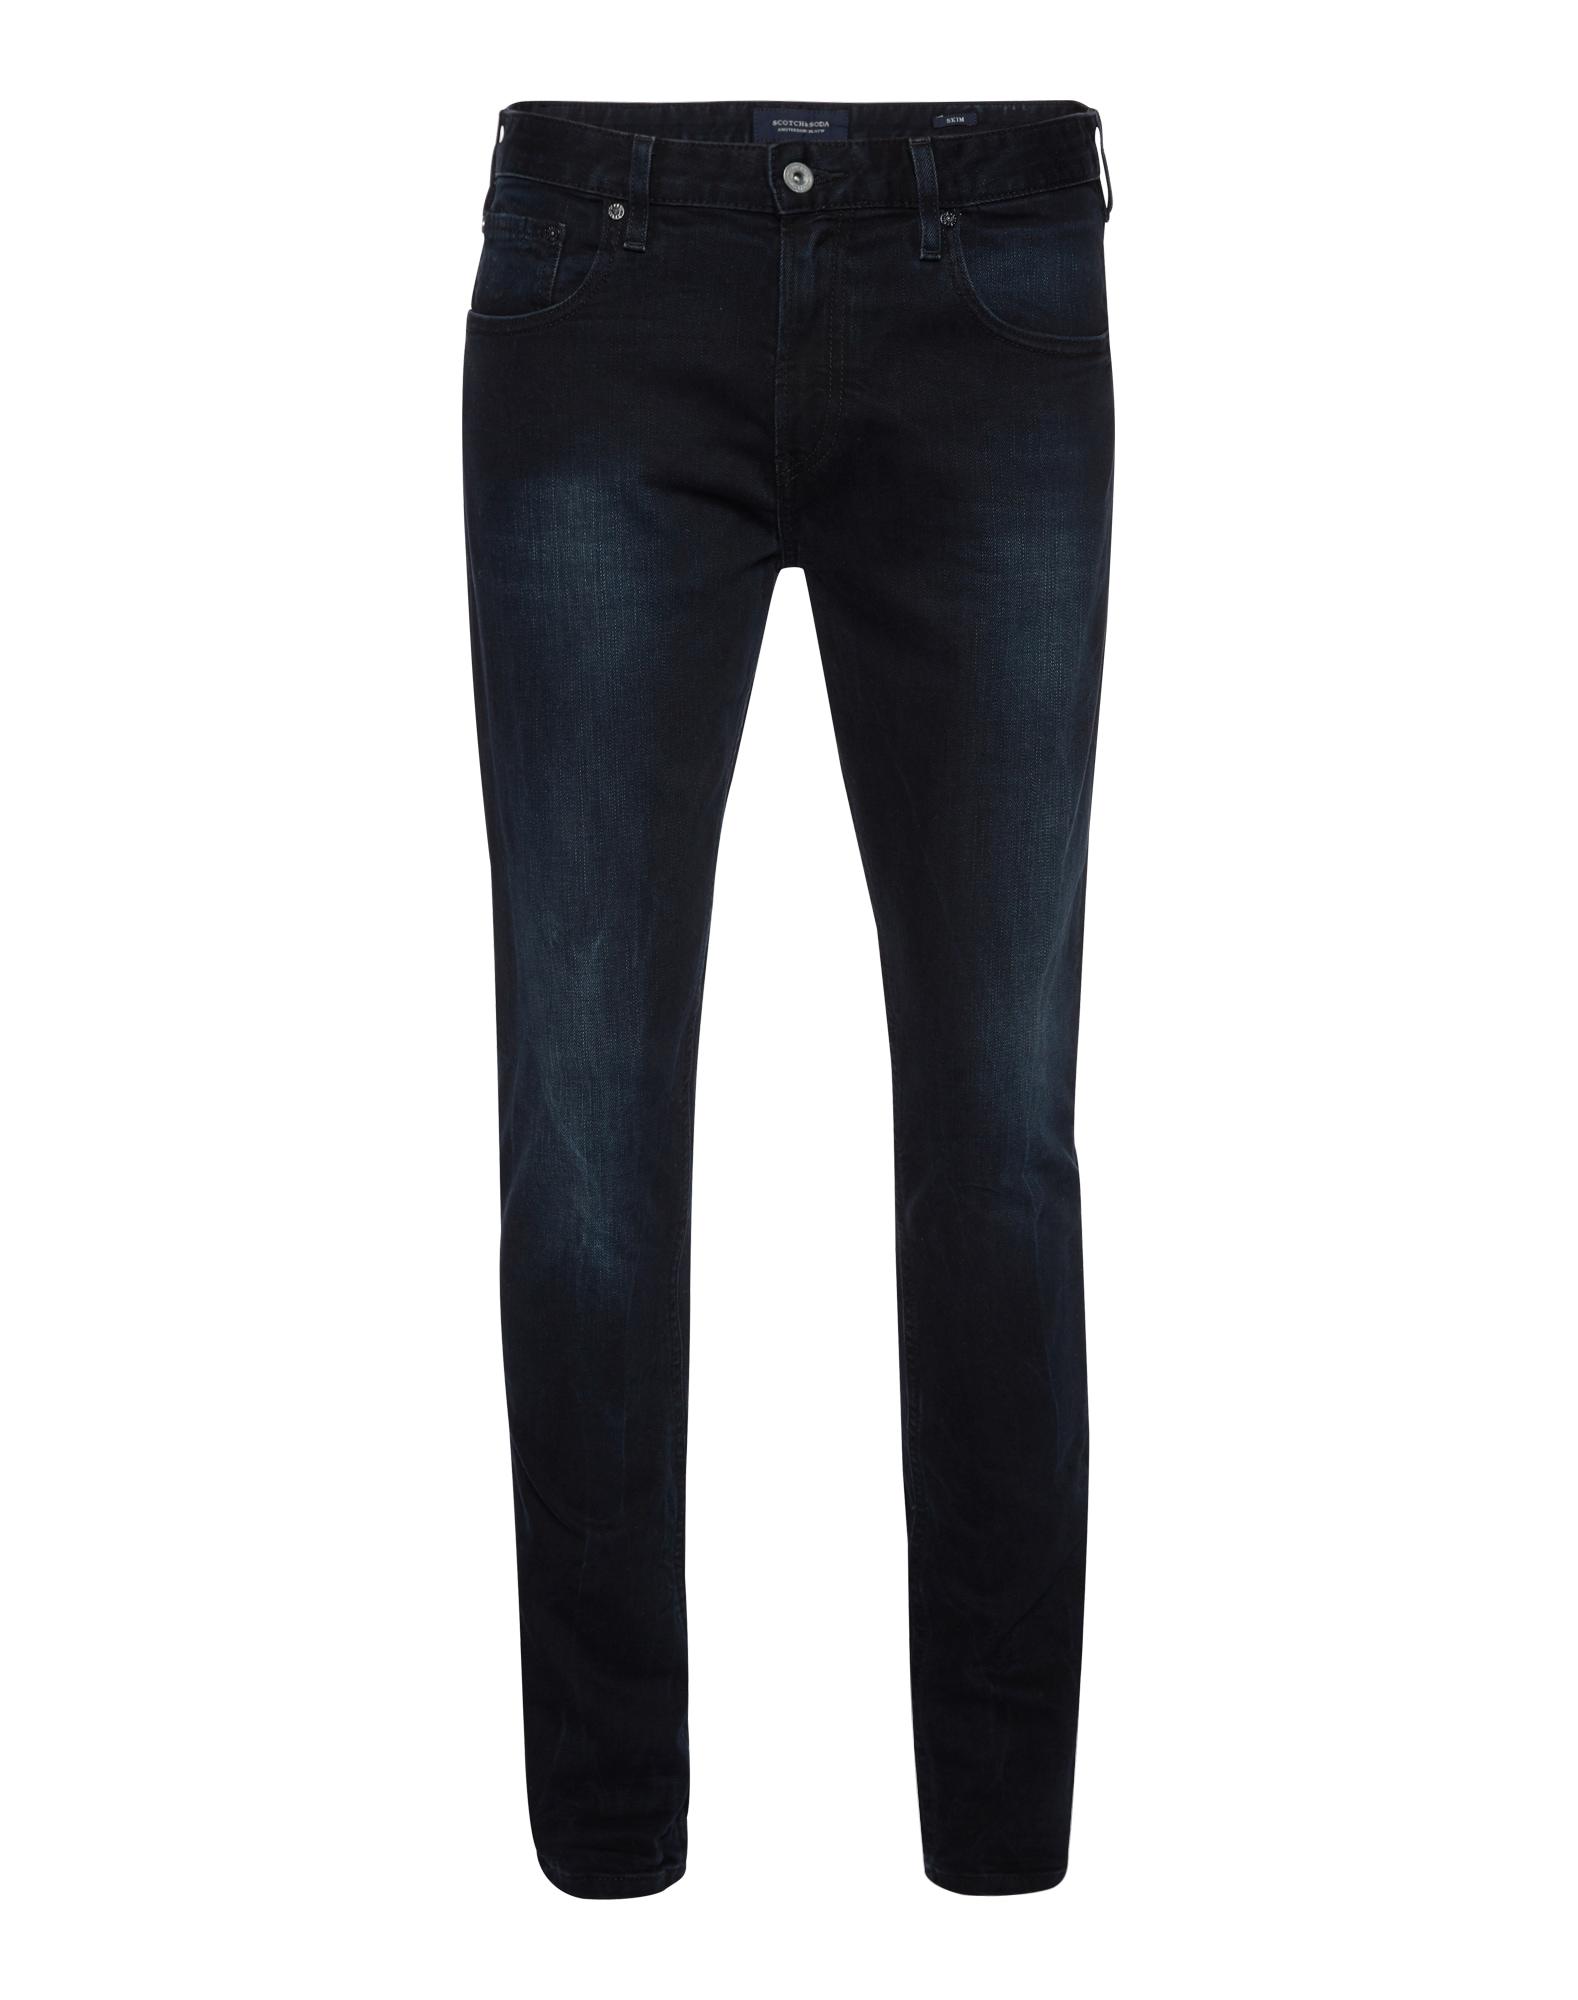 SCOTCH  and  SODA Heren Jeans Skim Jet Set donkerblauw